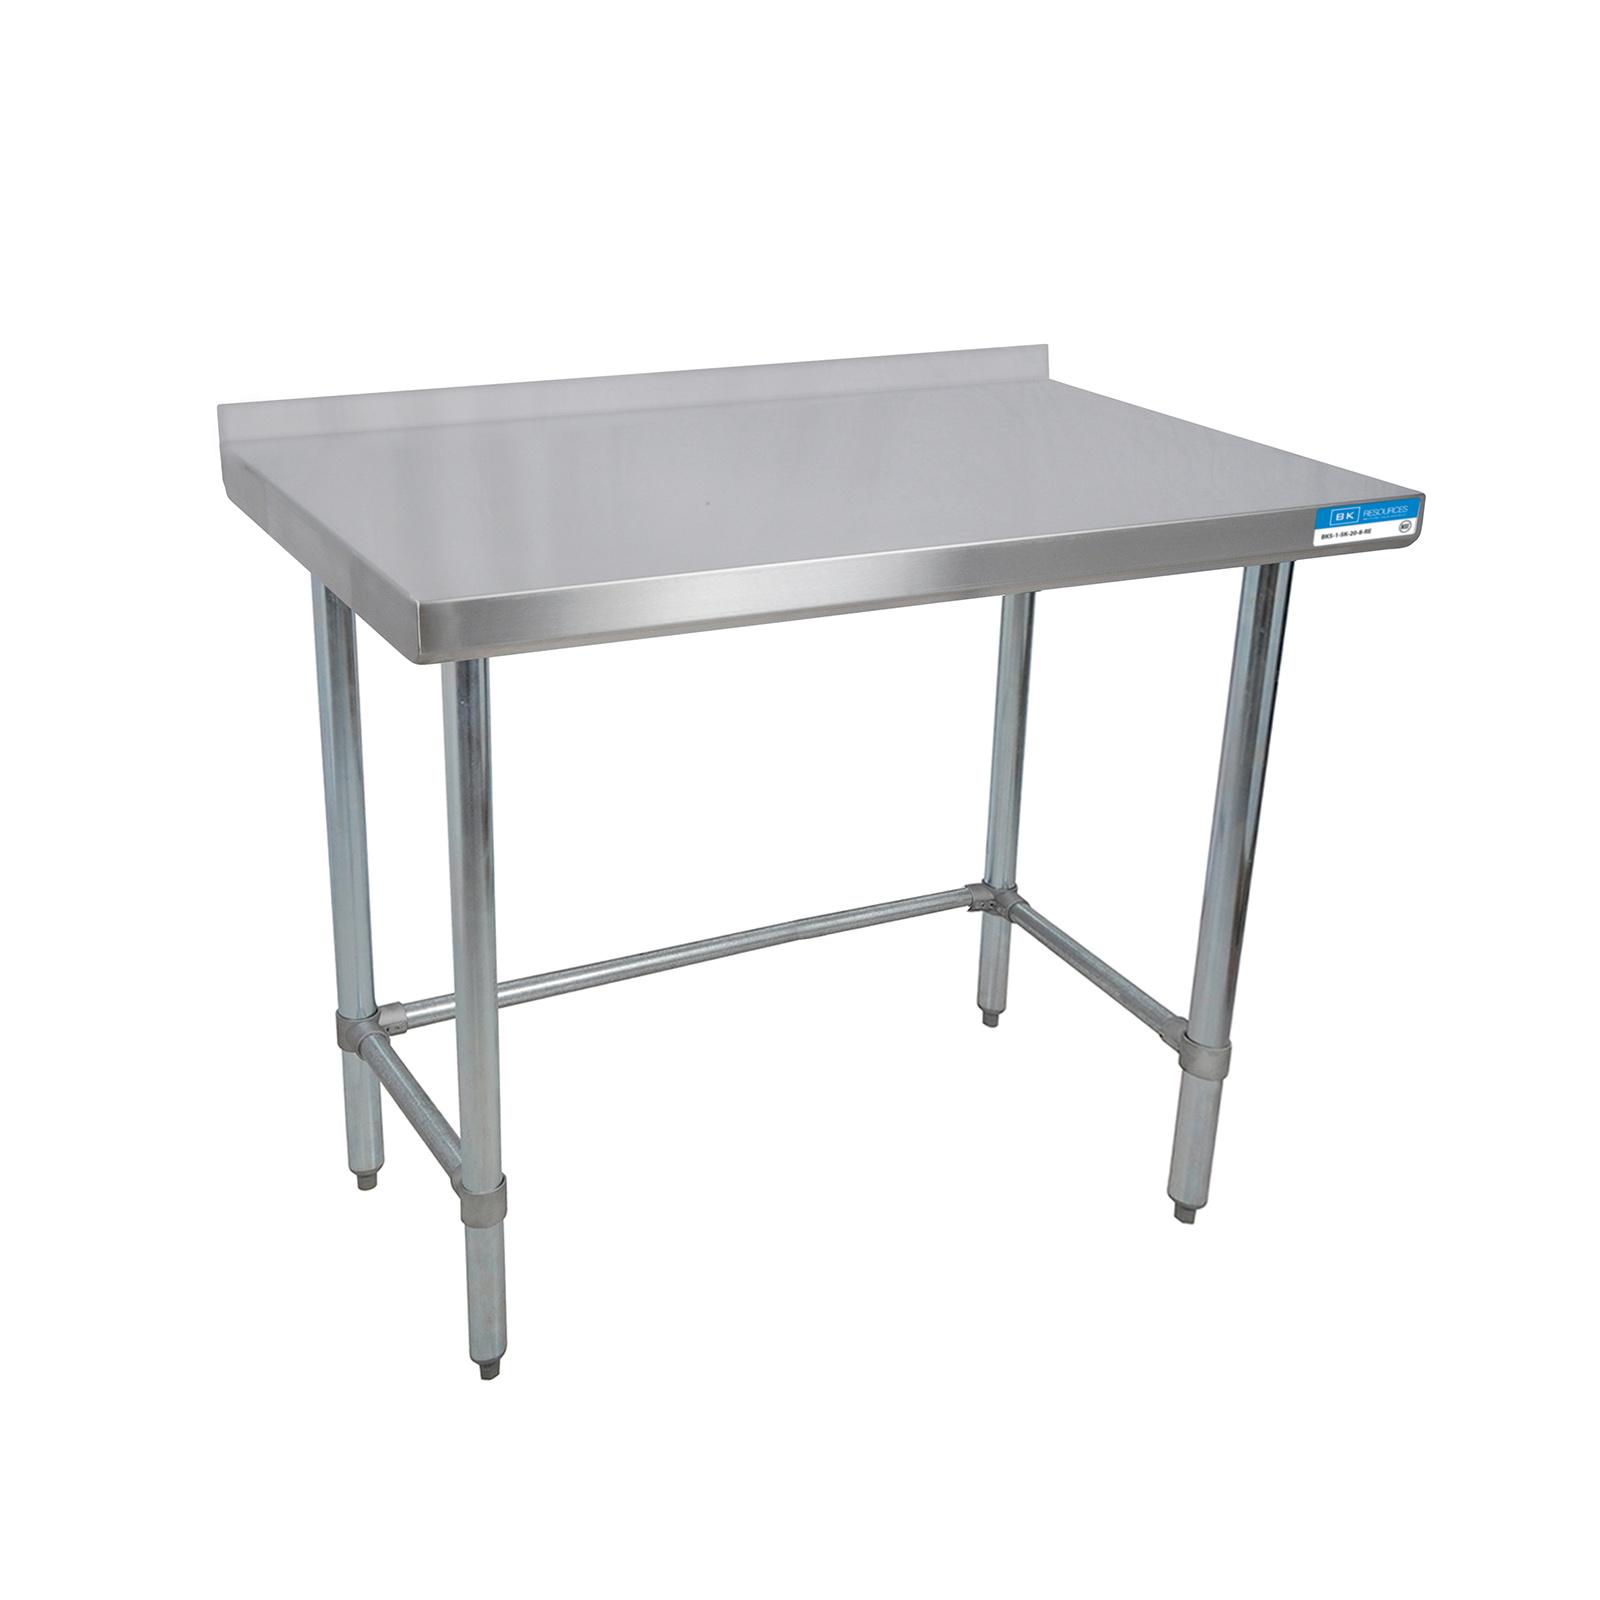 BK Resources SVTROB-8430 work table,  73